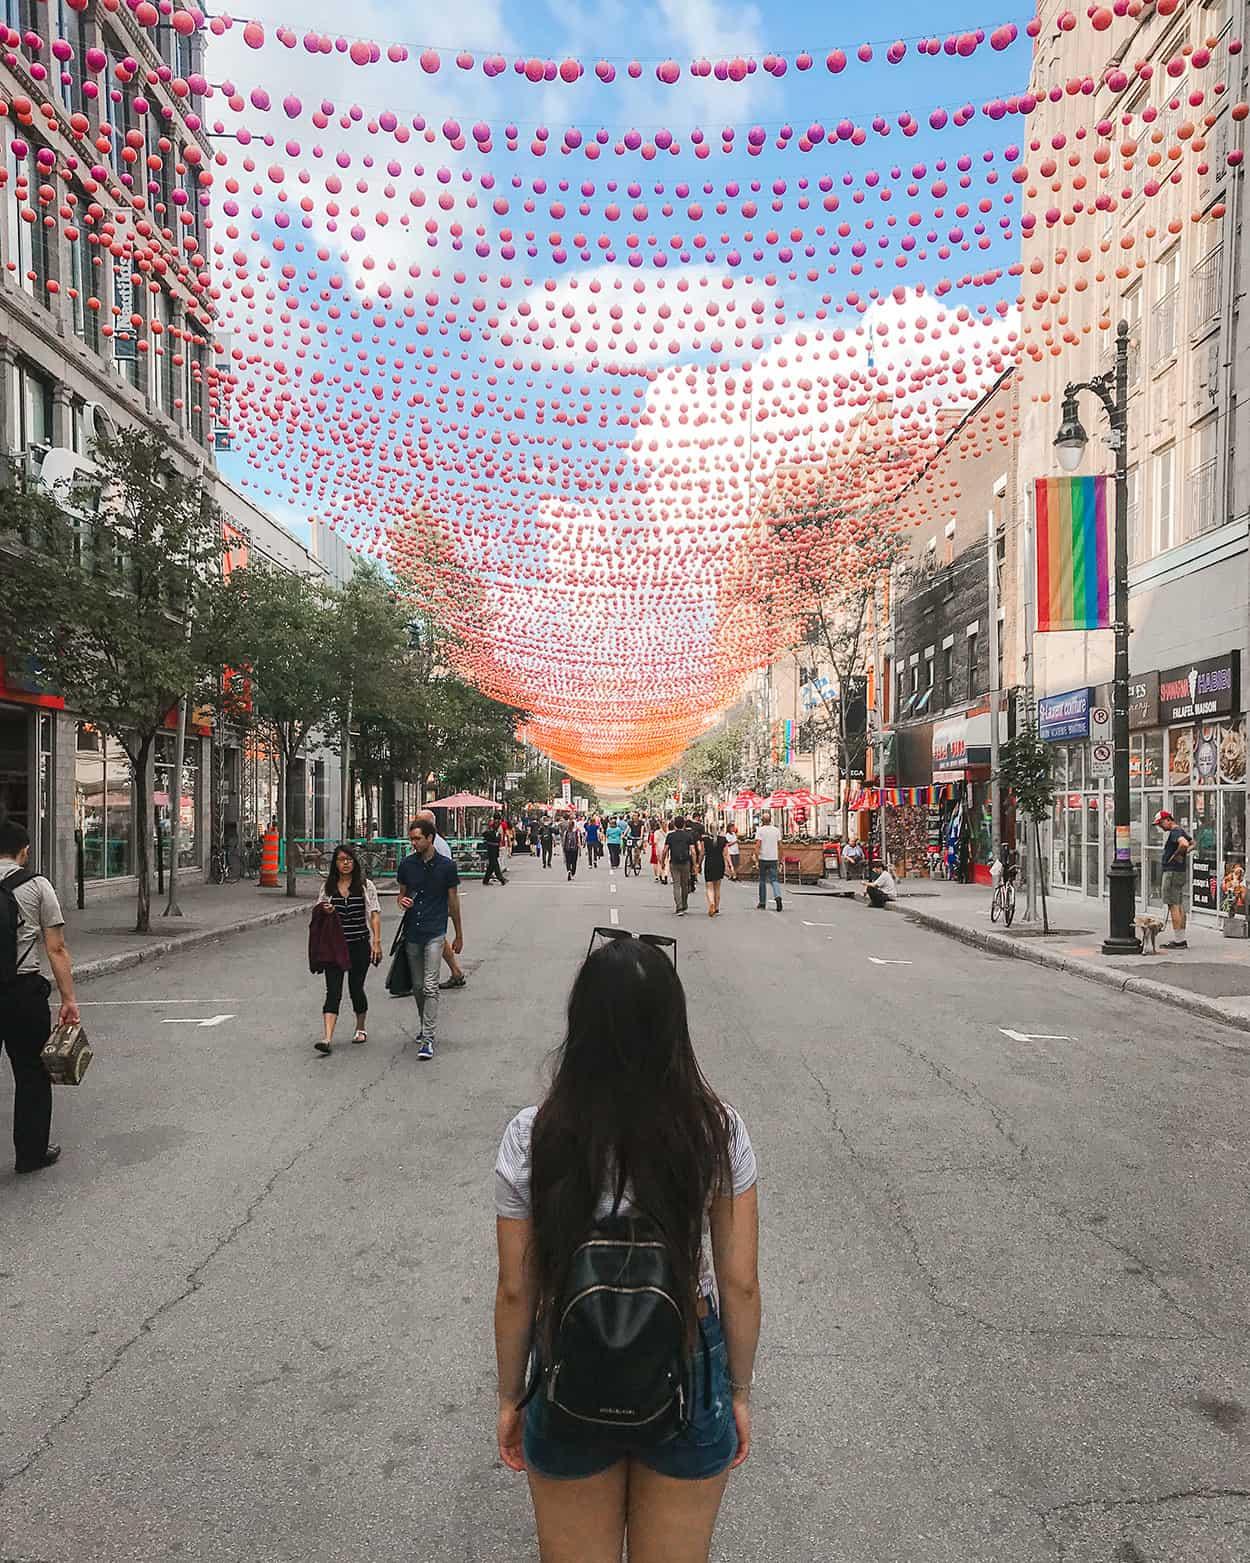 Saint-Catherine Street in the Village, Montreal